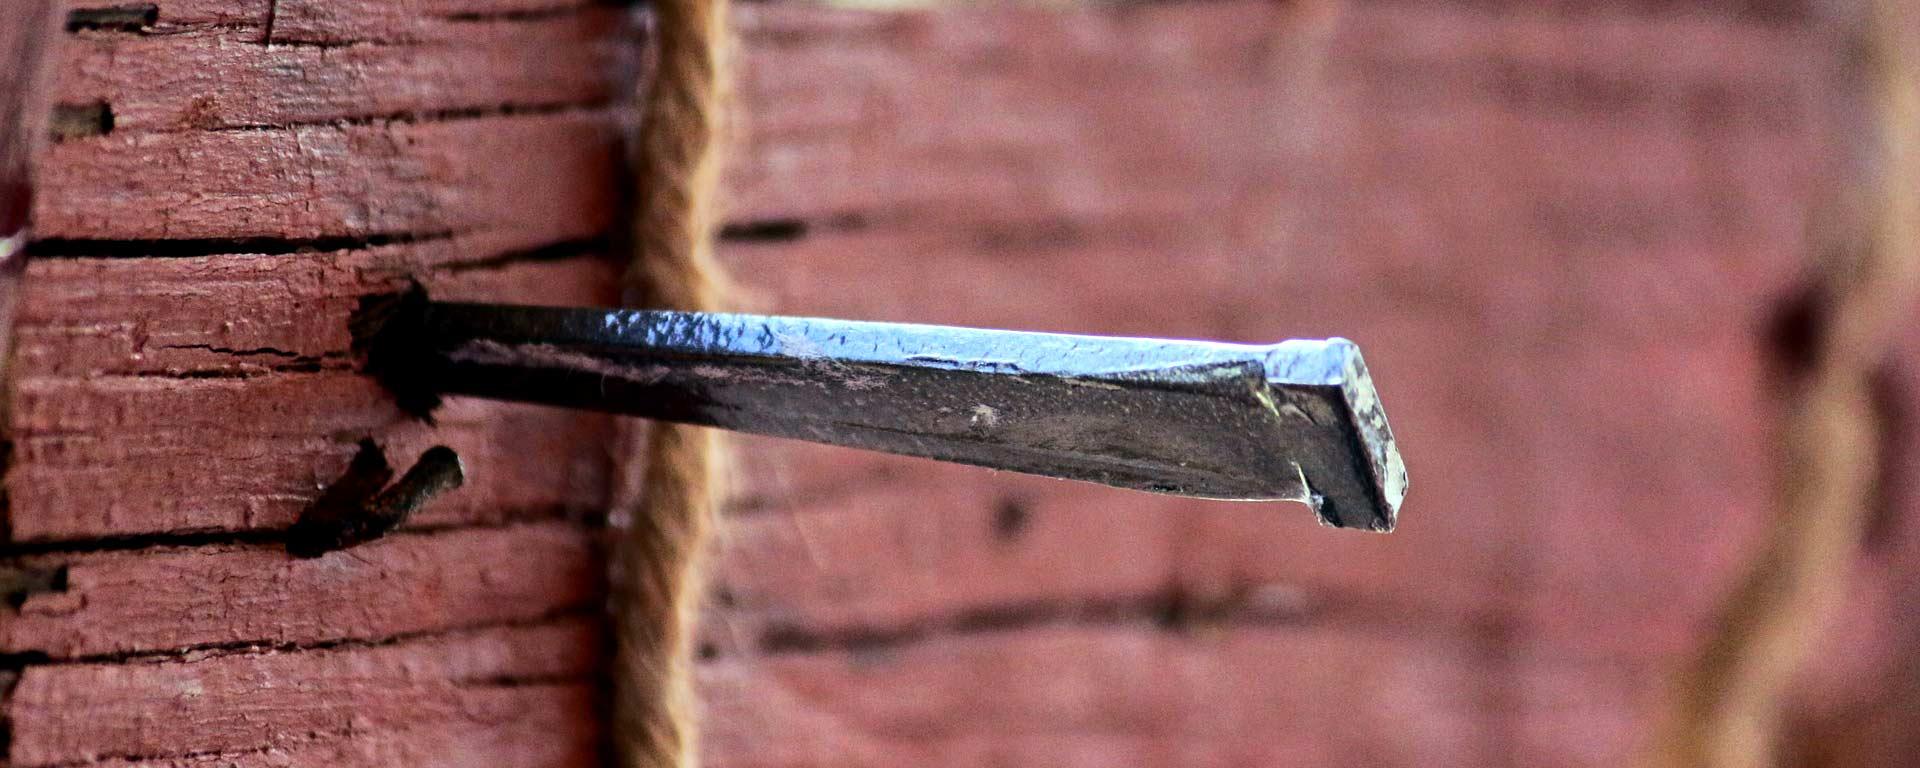 Stor spik som sitter i tvärslån på ett kors